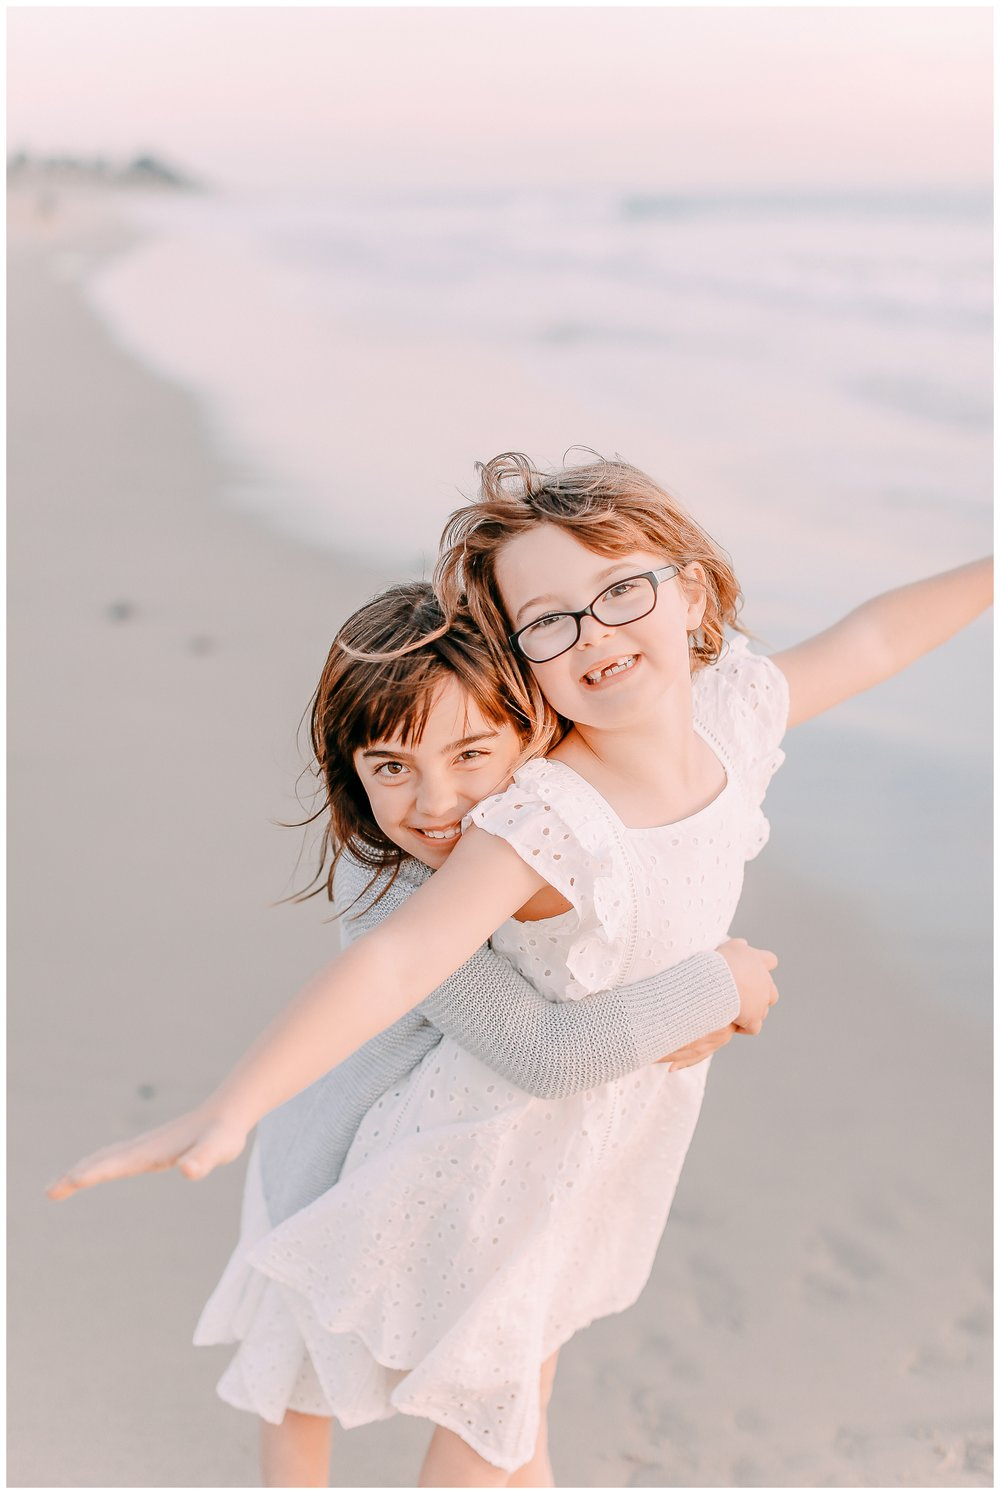 San_clemente_family_session_Orange_county_family_photographer_cori_kleckner_photography_laguna_beach_family_session_0714.jpg